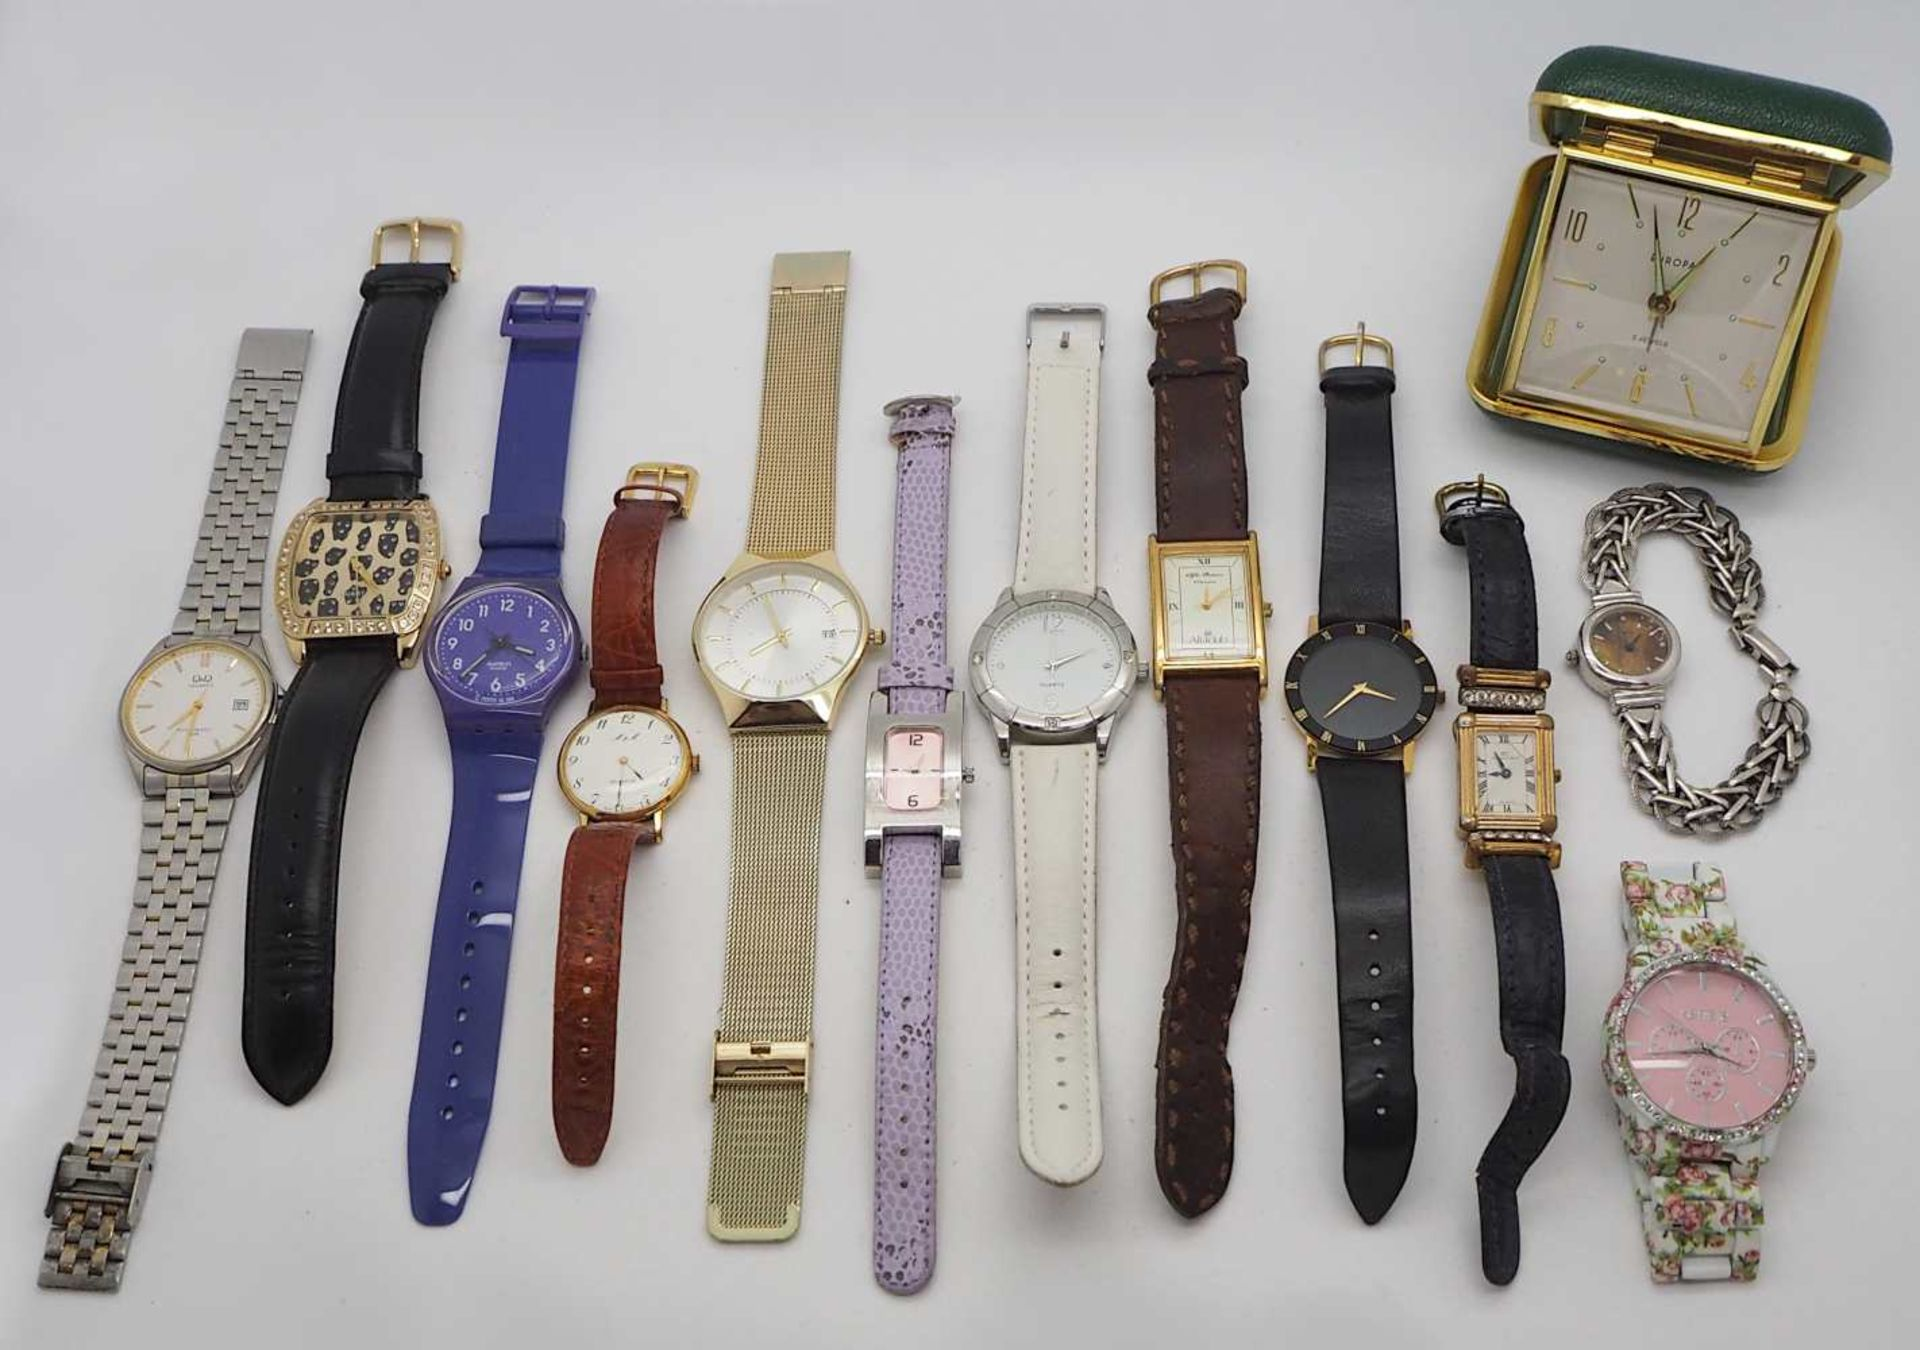 1 Konv. Armbanduhren Metall z.T. verg. Kunststoff u.a. Tsp./besch. im Karton